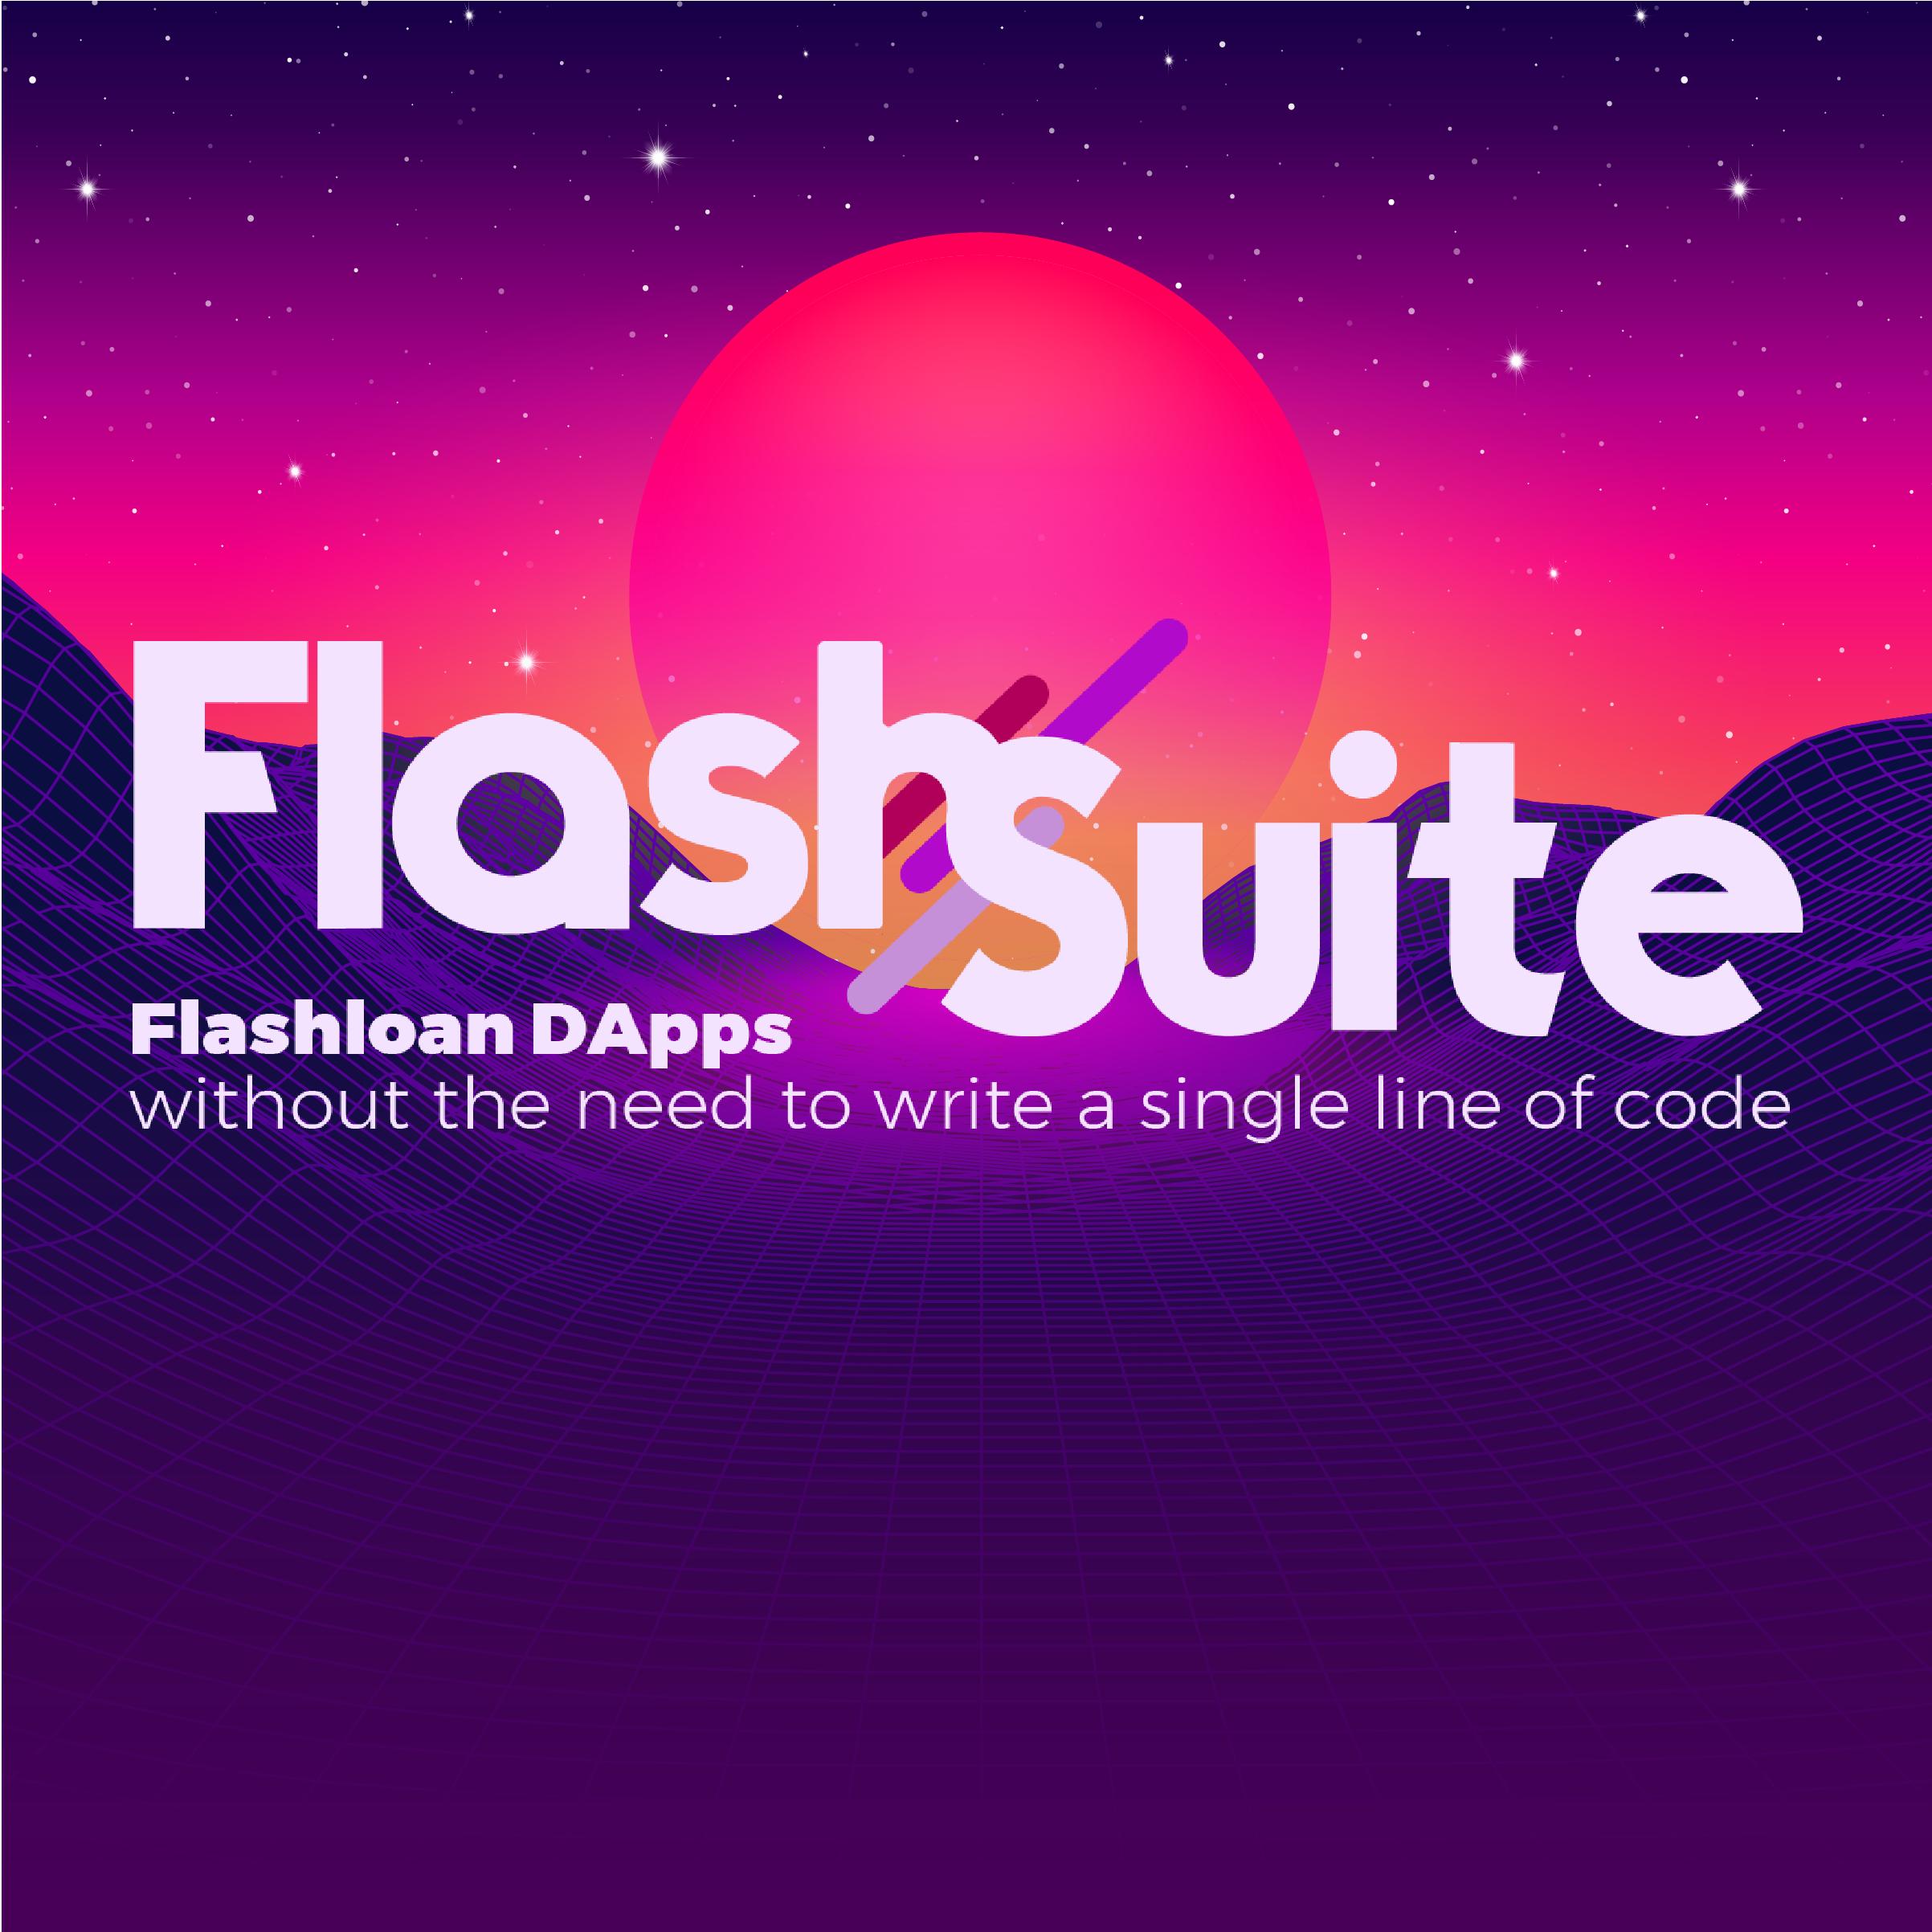 FlashSuite